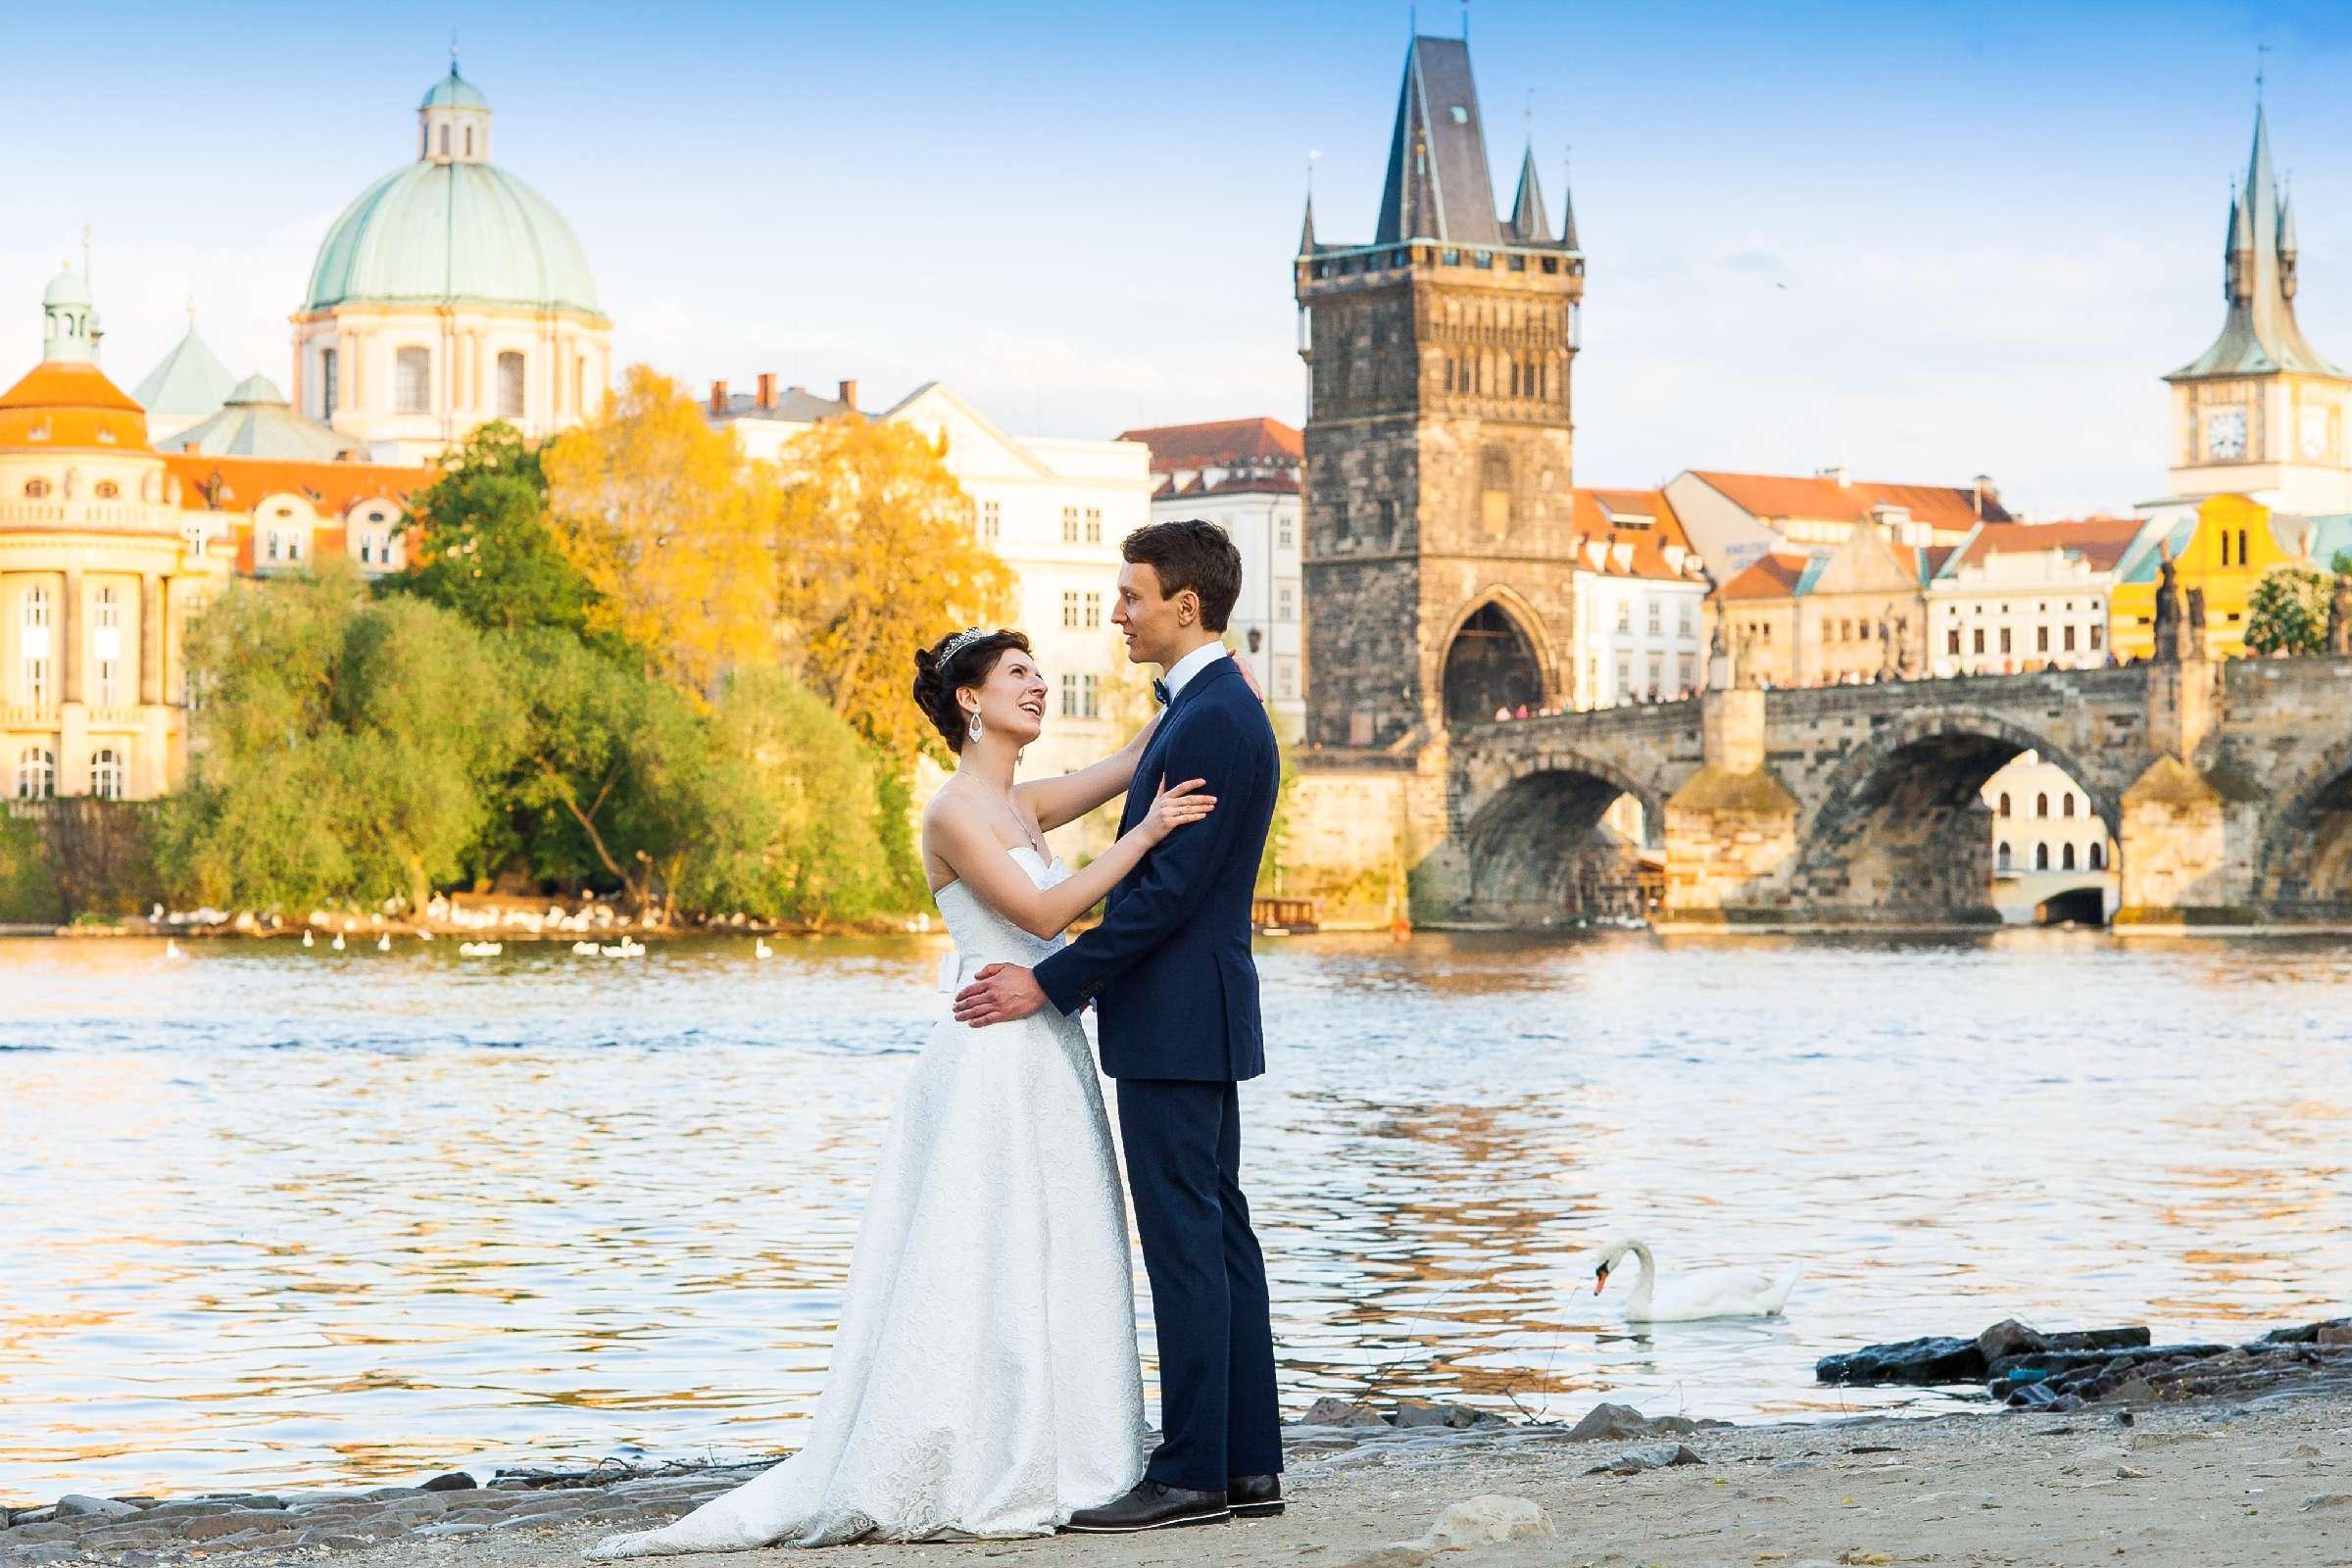 Фотосъемка на фоне Карлового моста